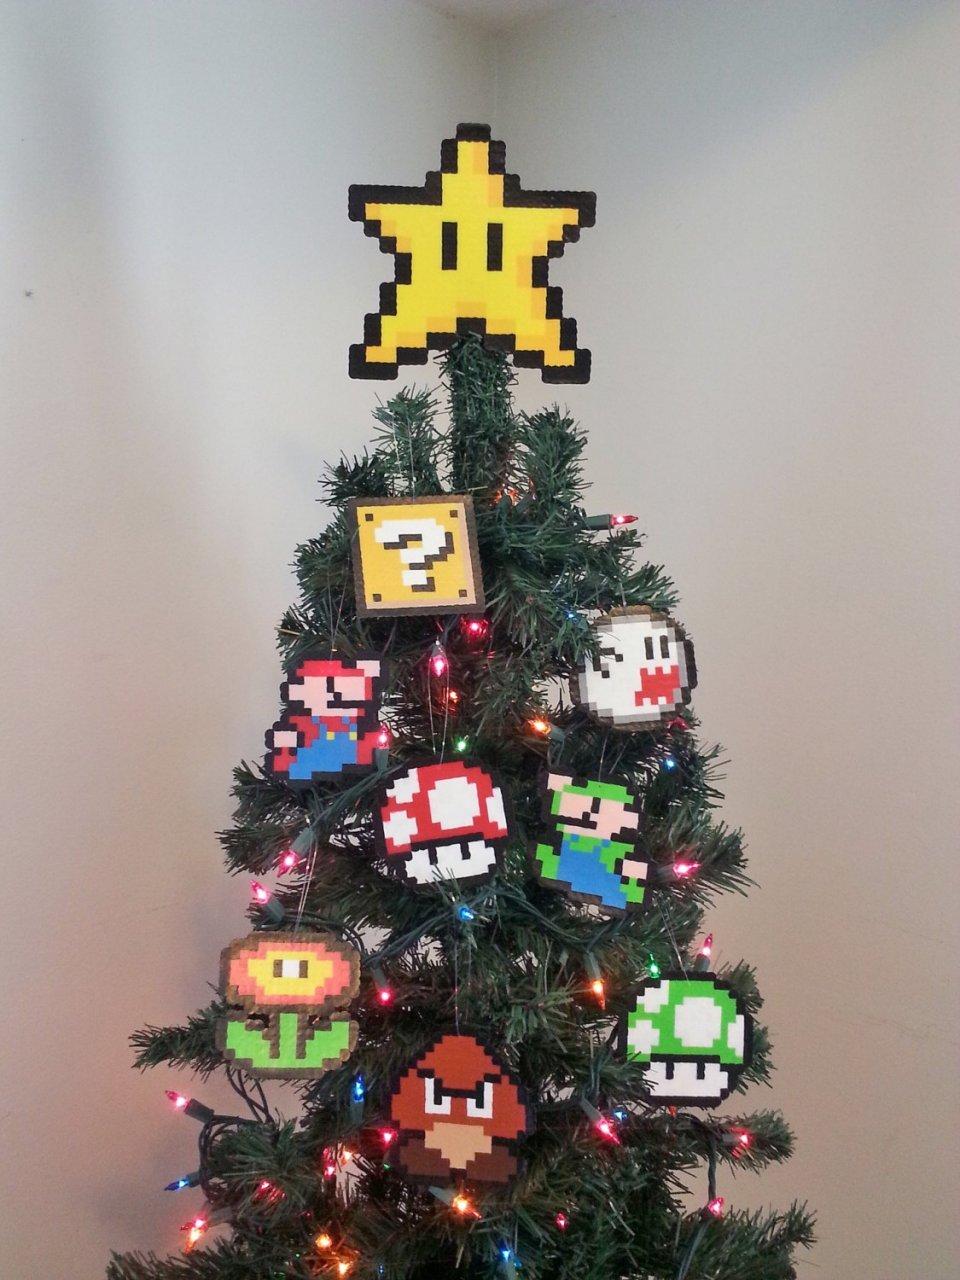 Super Mario Bros. Christmas Ornament Set: Have a Merry Mario and a ...